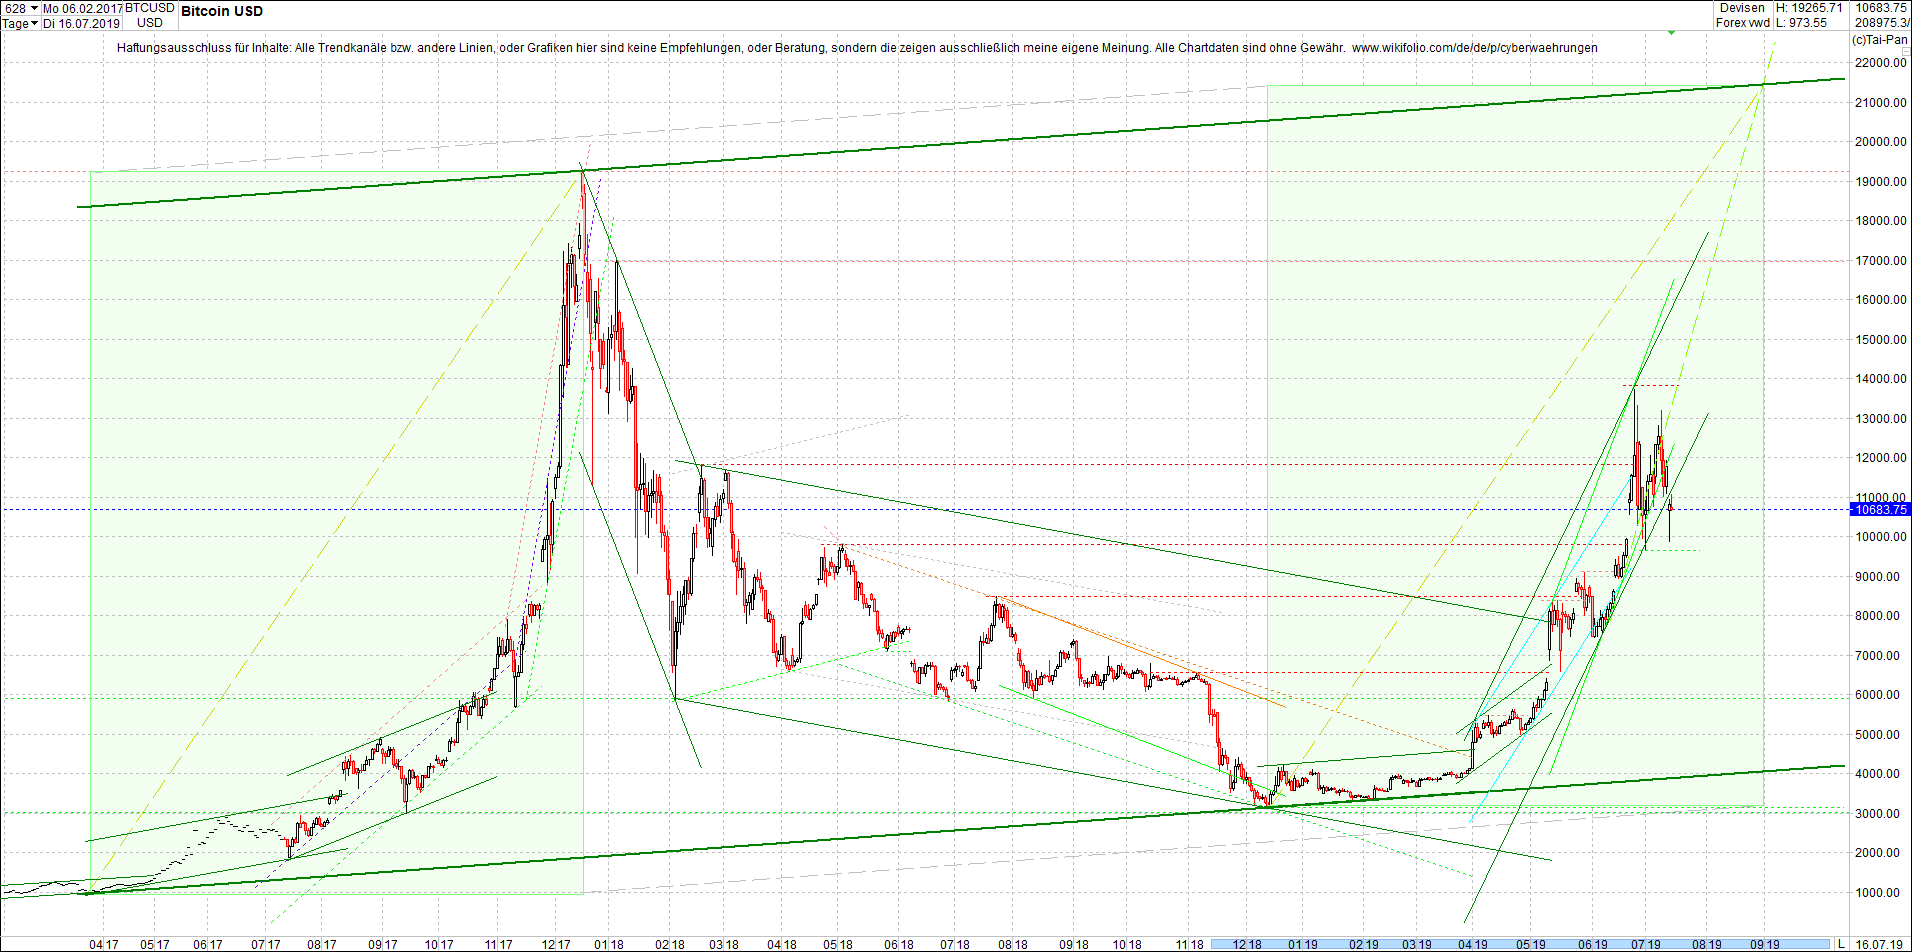 bitcoin_(btc)_chart_heute_morgen.png